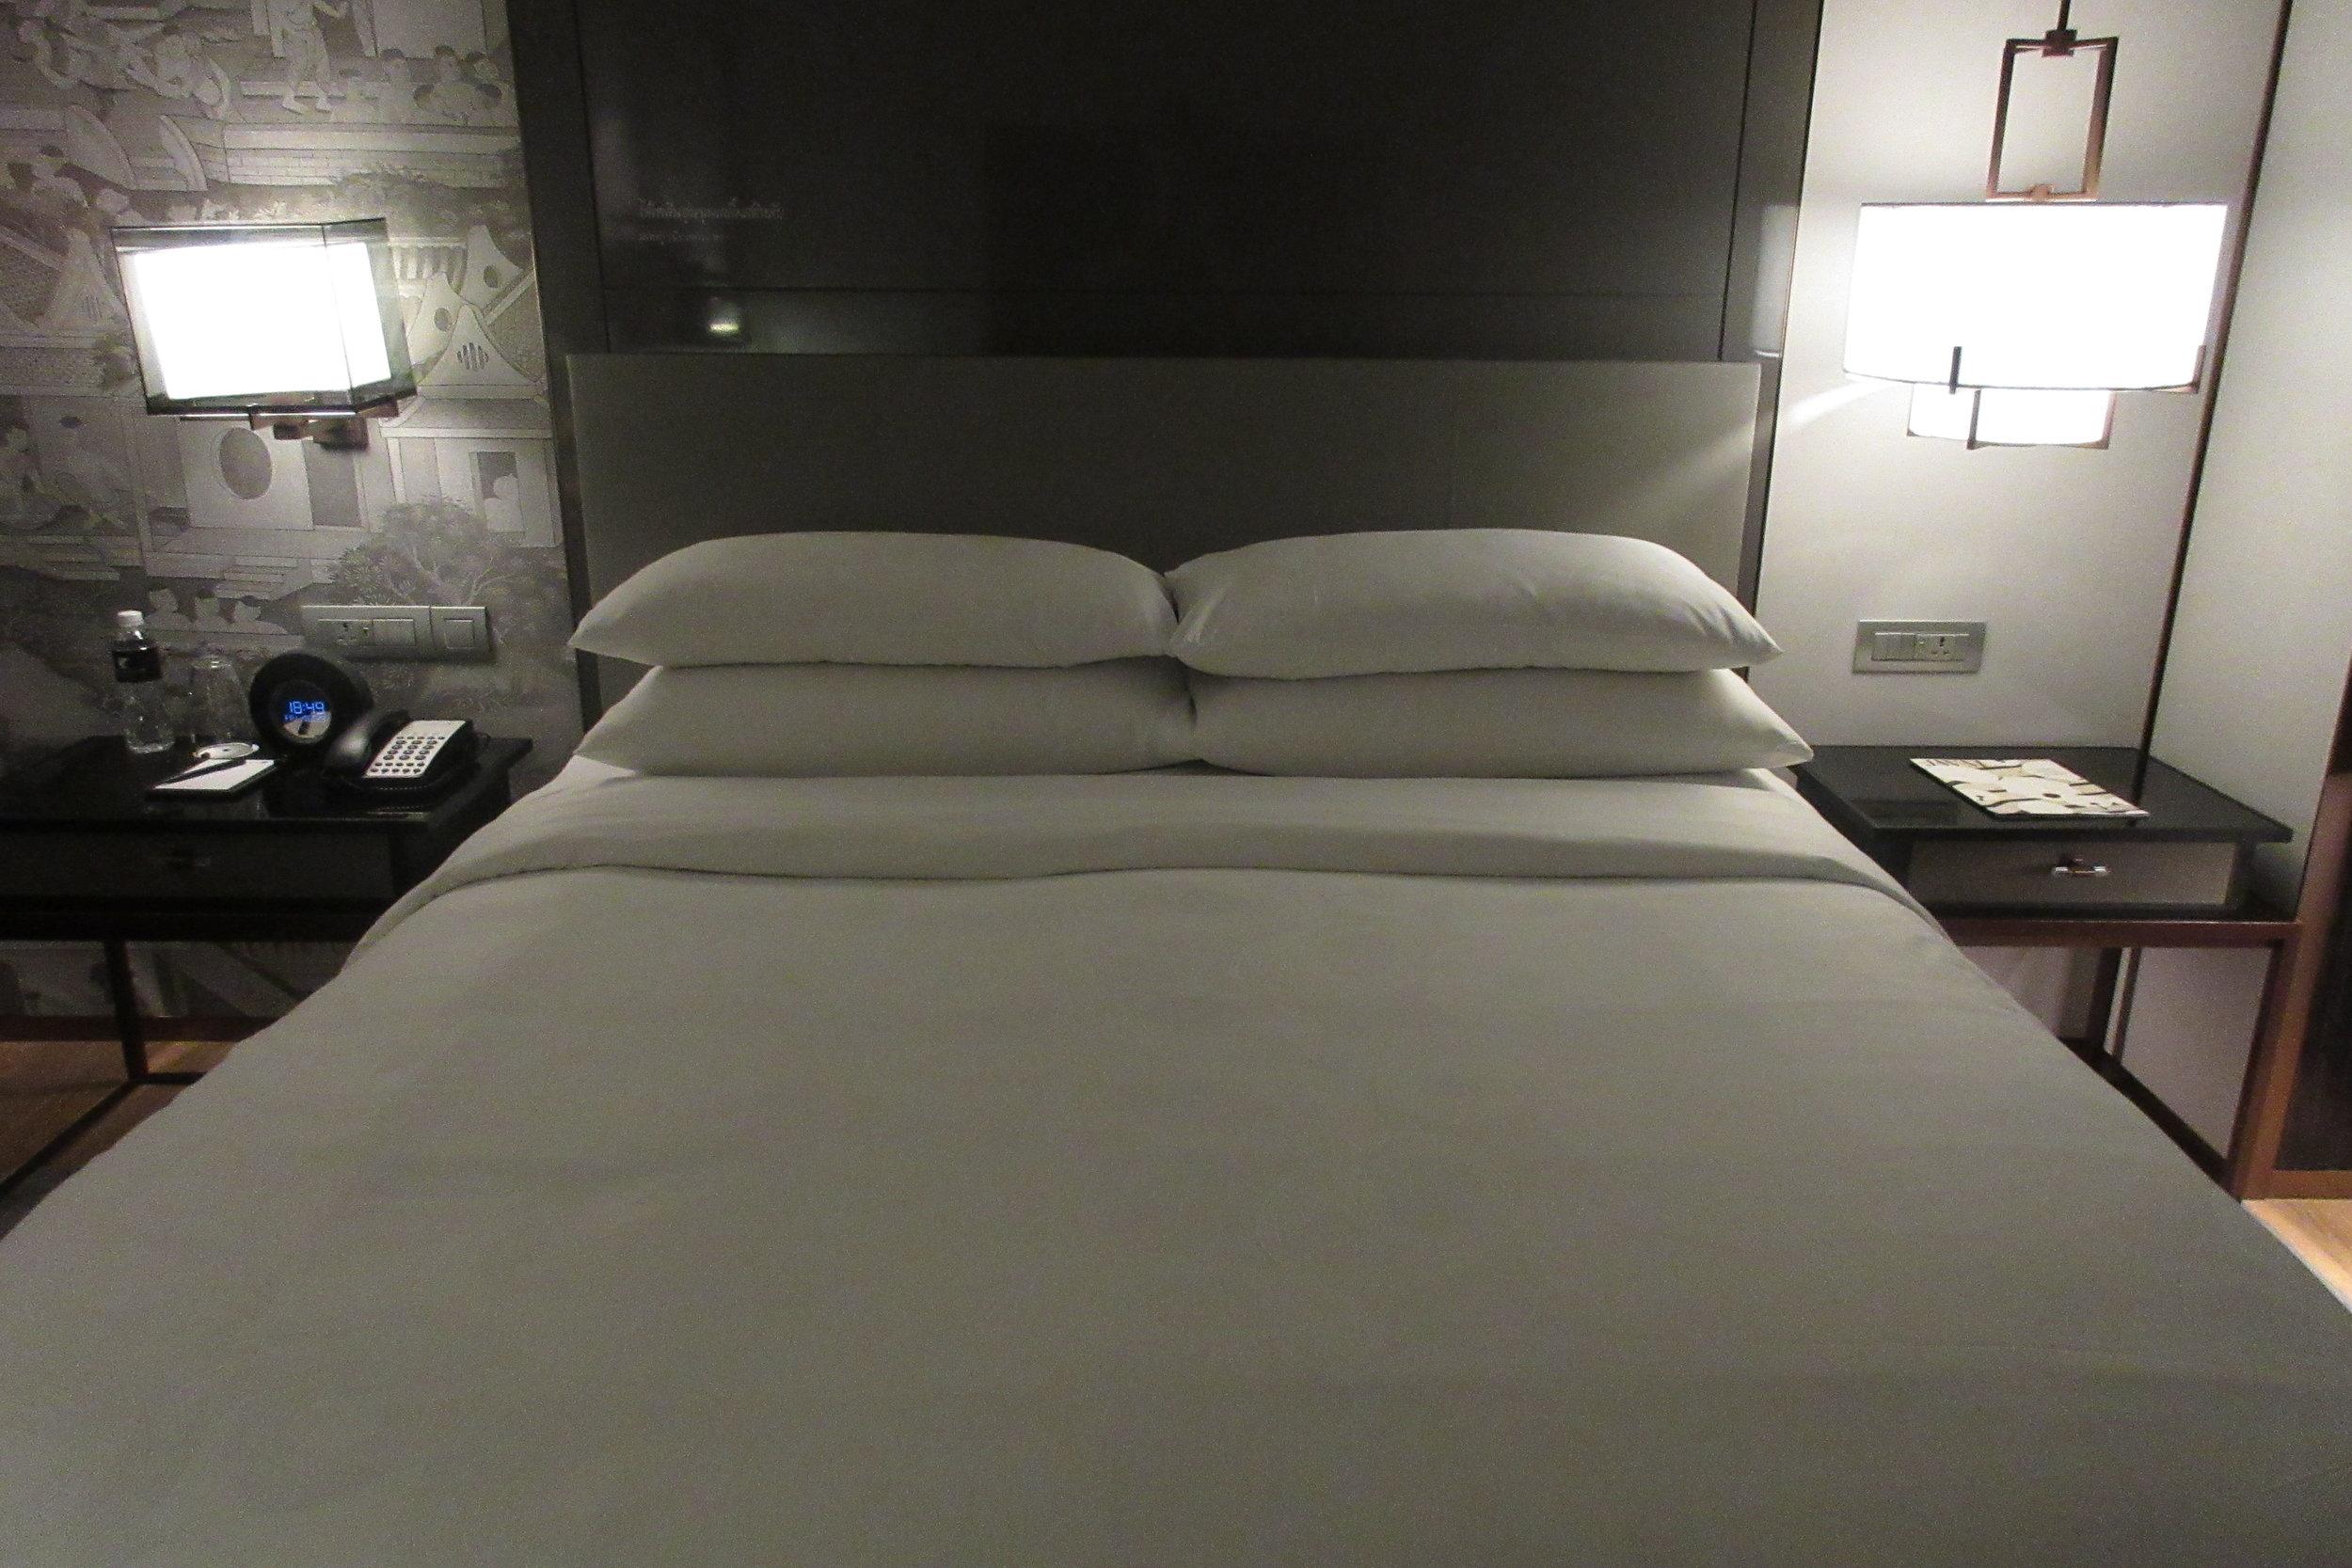 JW Marriott Bangkok – King bed